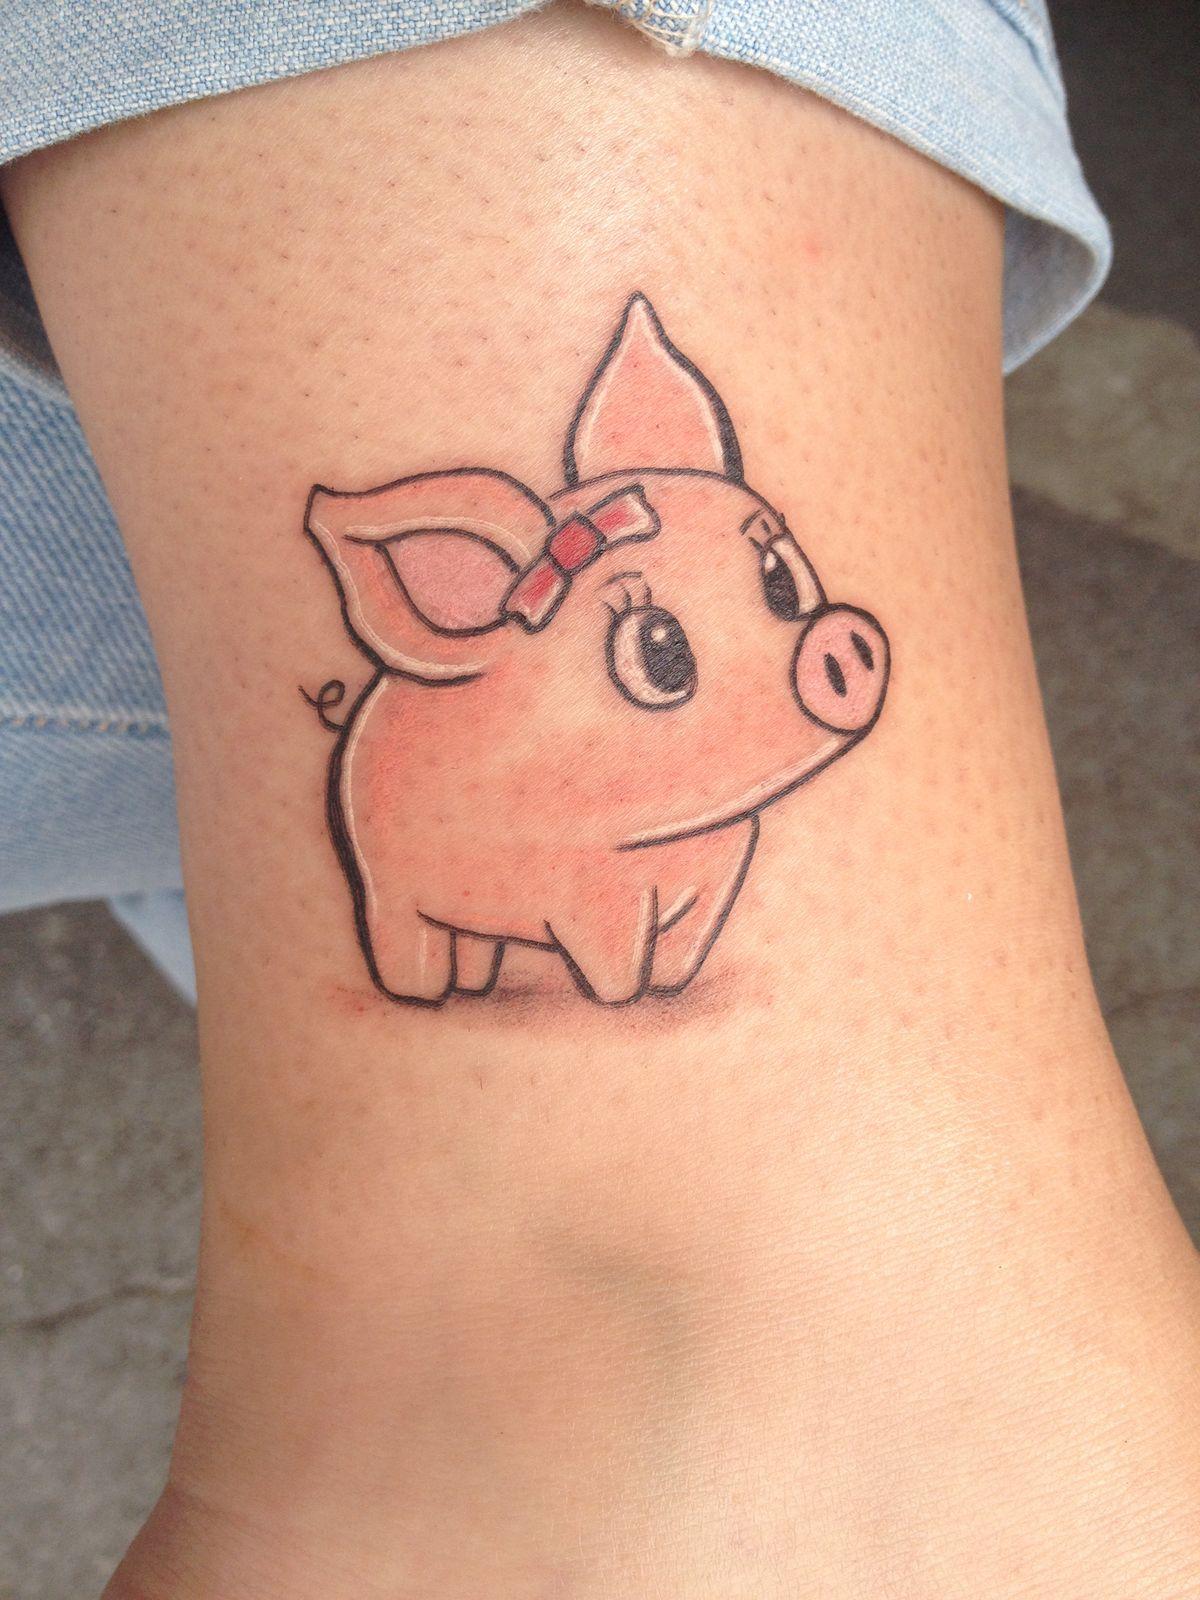 Tattoos amp Ideas On Pinterest Tattoo Studio And Search